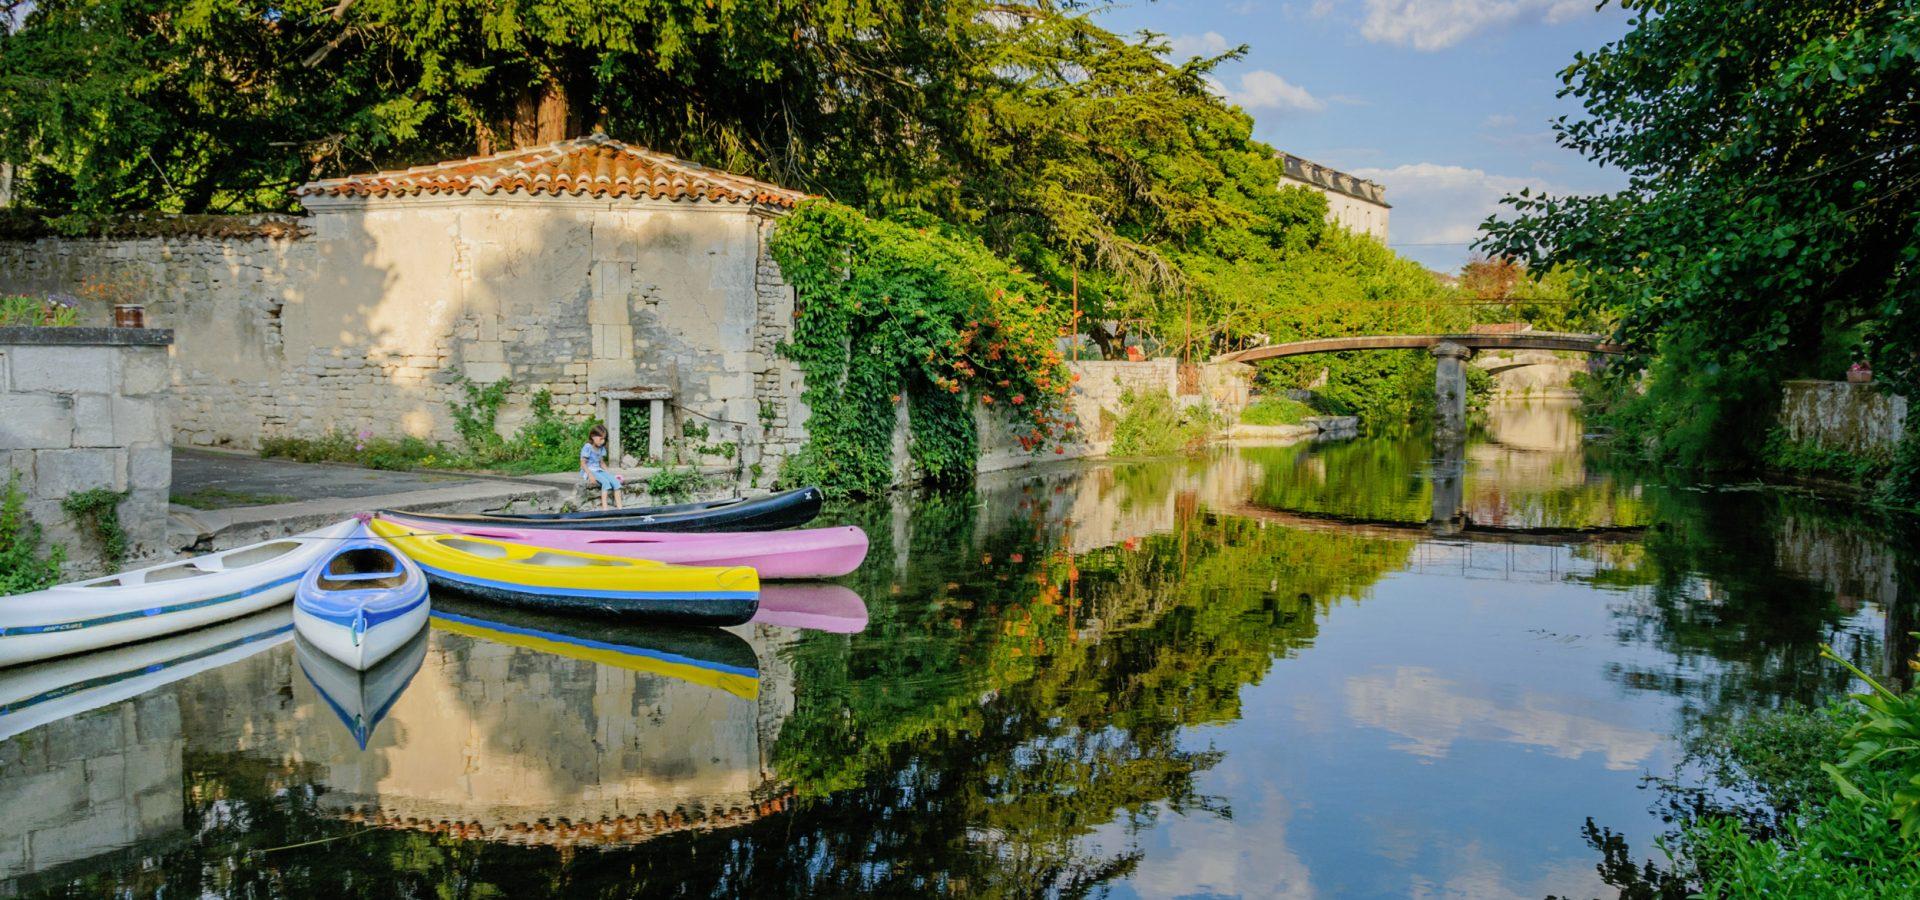 Visite au fil du fleuve Charente